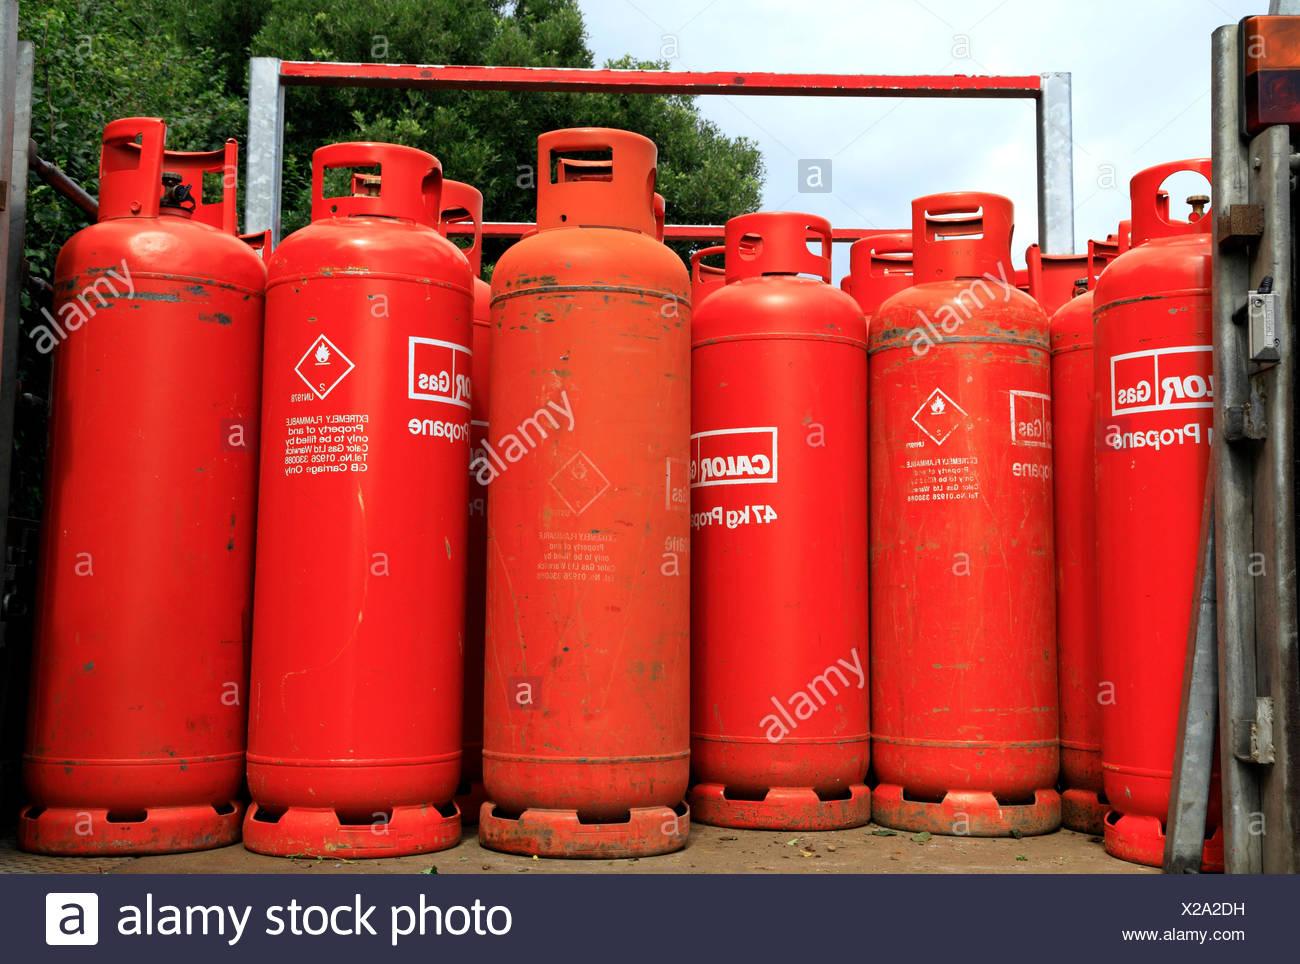 Lpg Gas Bottles For Central Heating